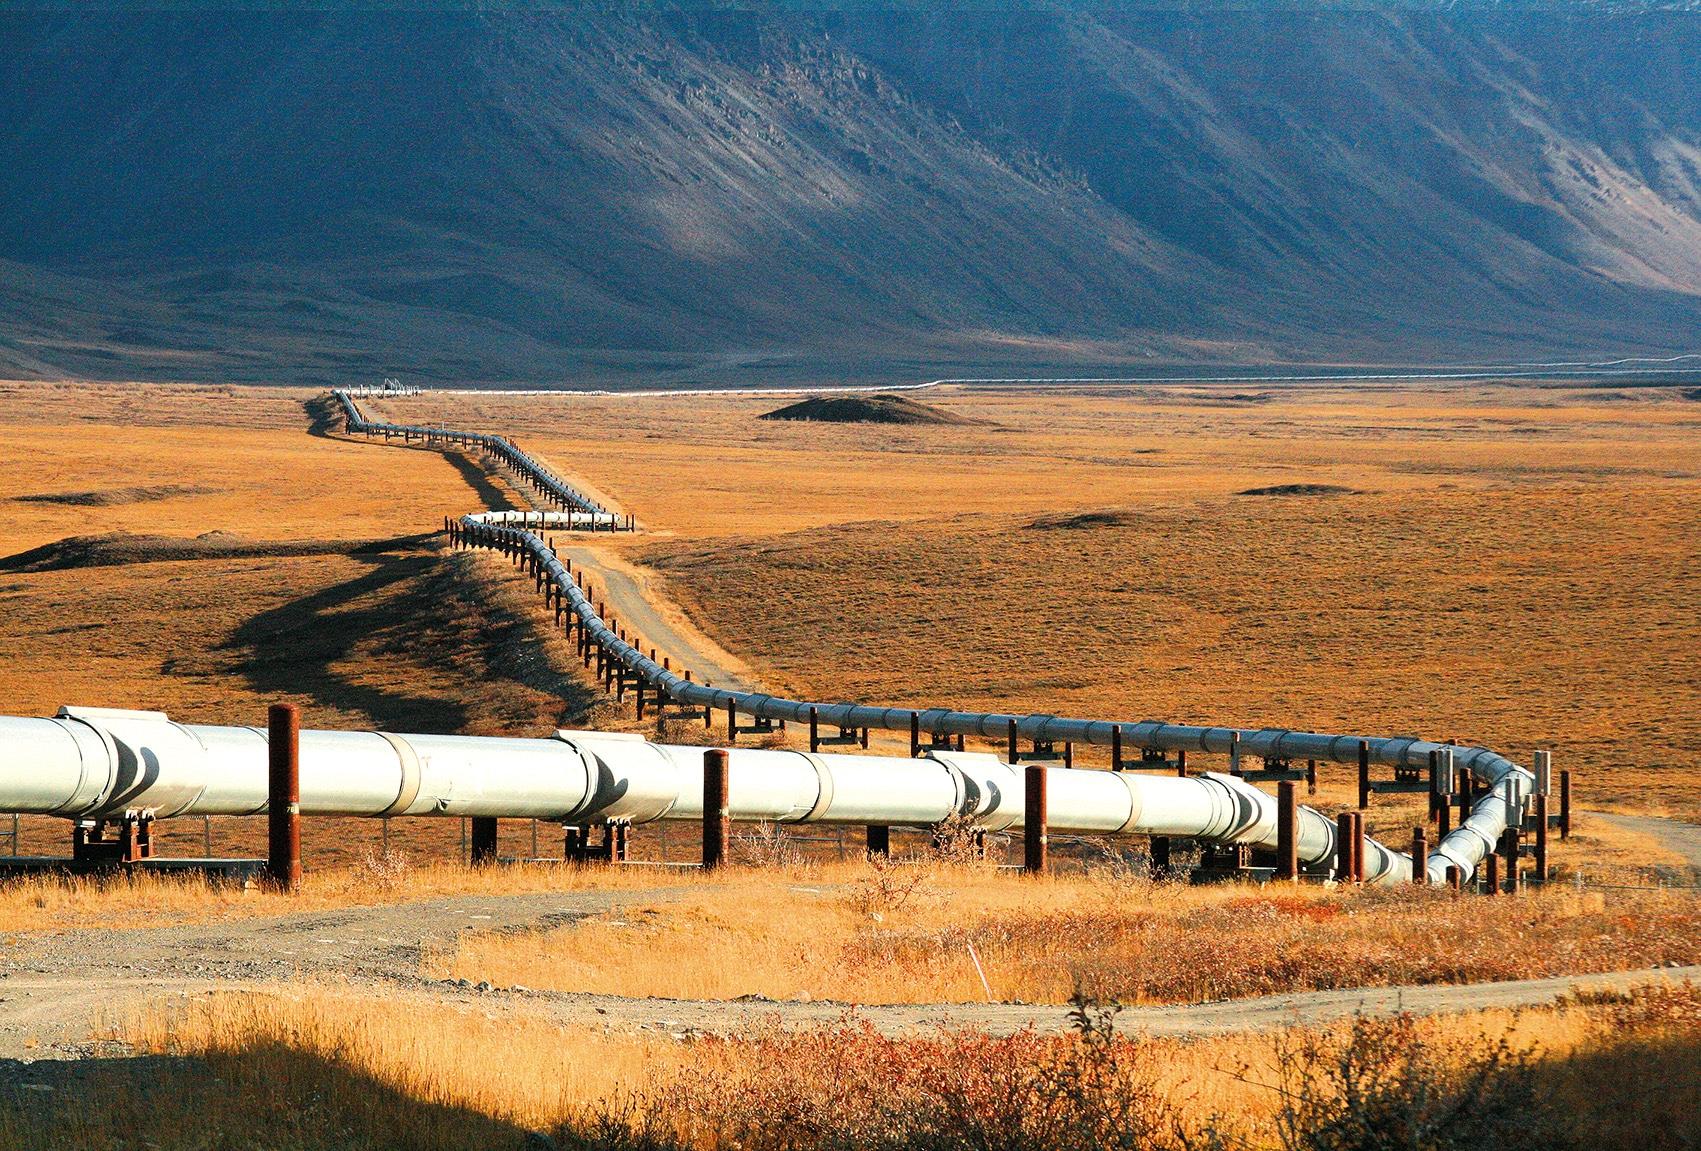 40 European, African Organizations Say No to Nigeria-Morocco Gas